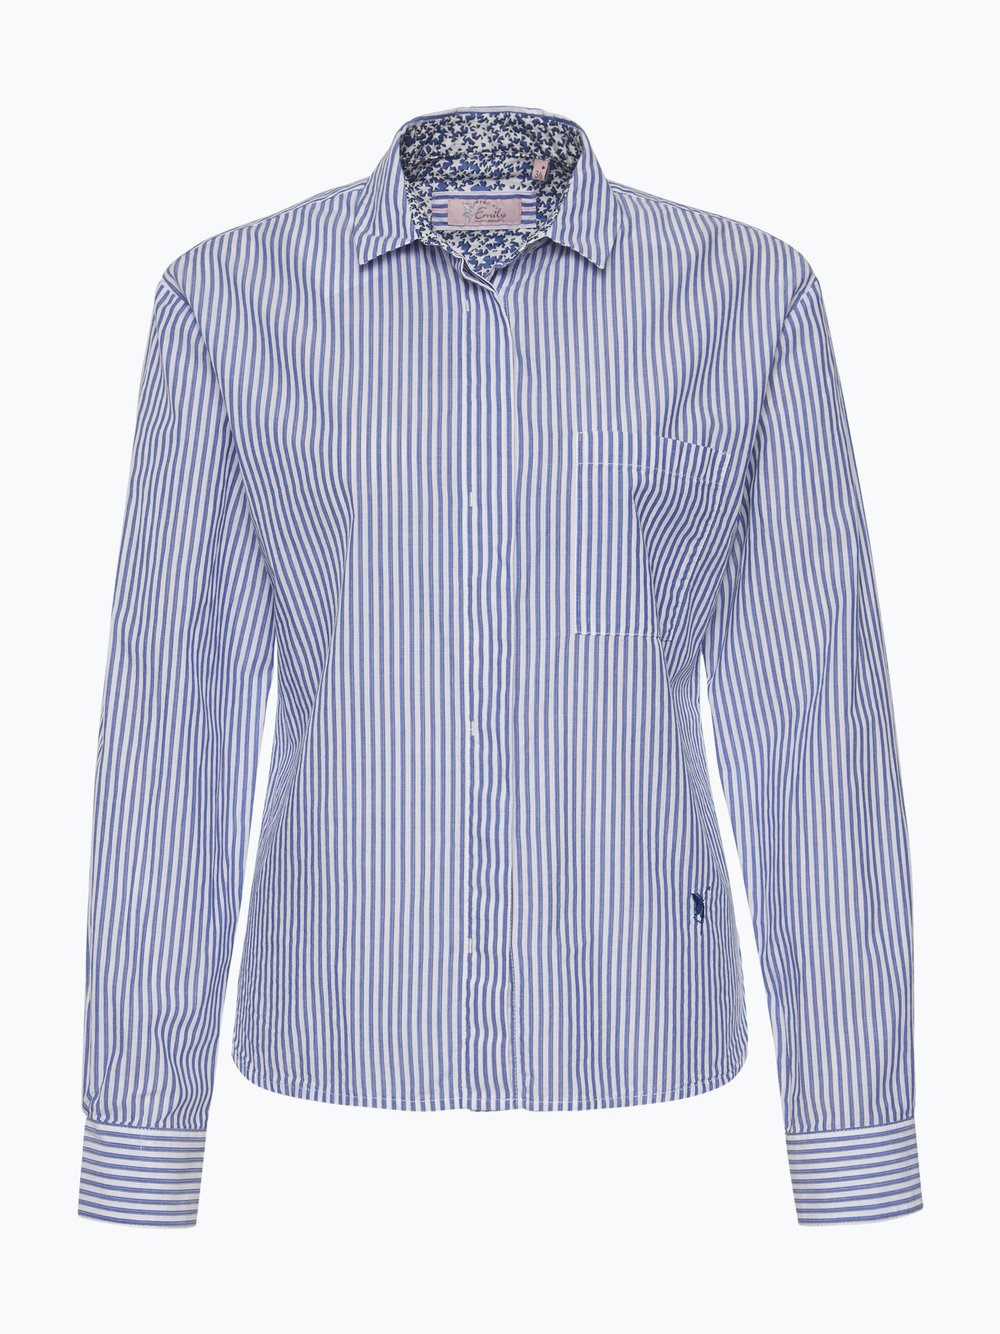 ce41cb8bc4d25f Emily van den Bergh Damen Bluse online kaufen